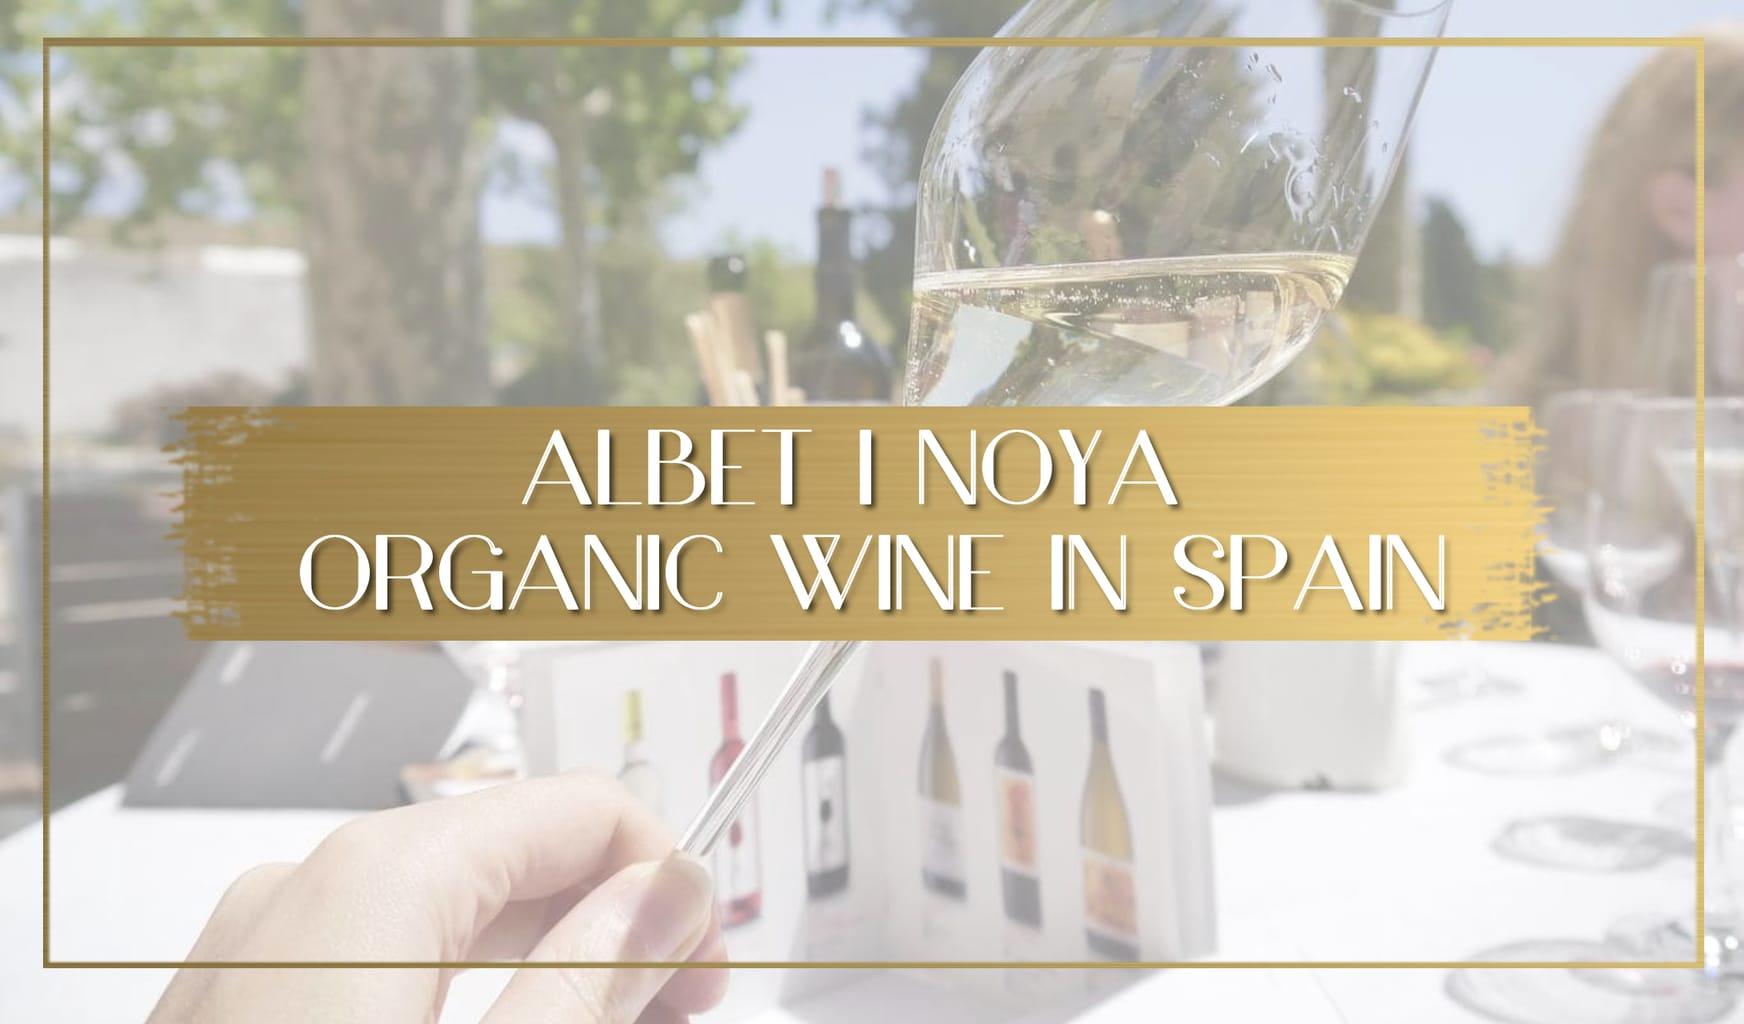 Albet i Noya Organic Wine in Spain main